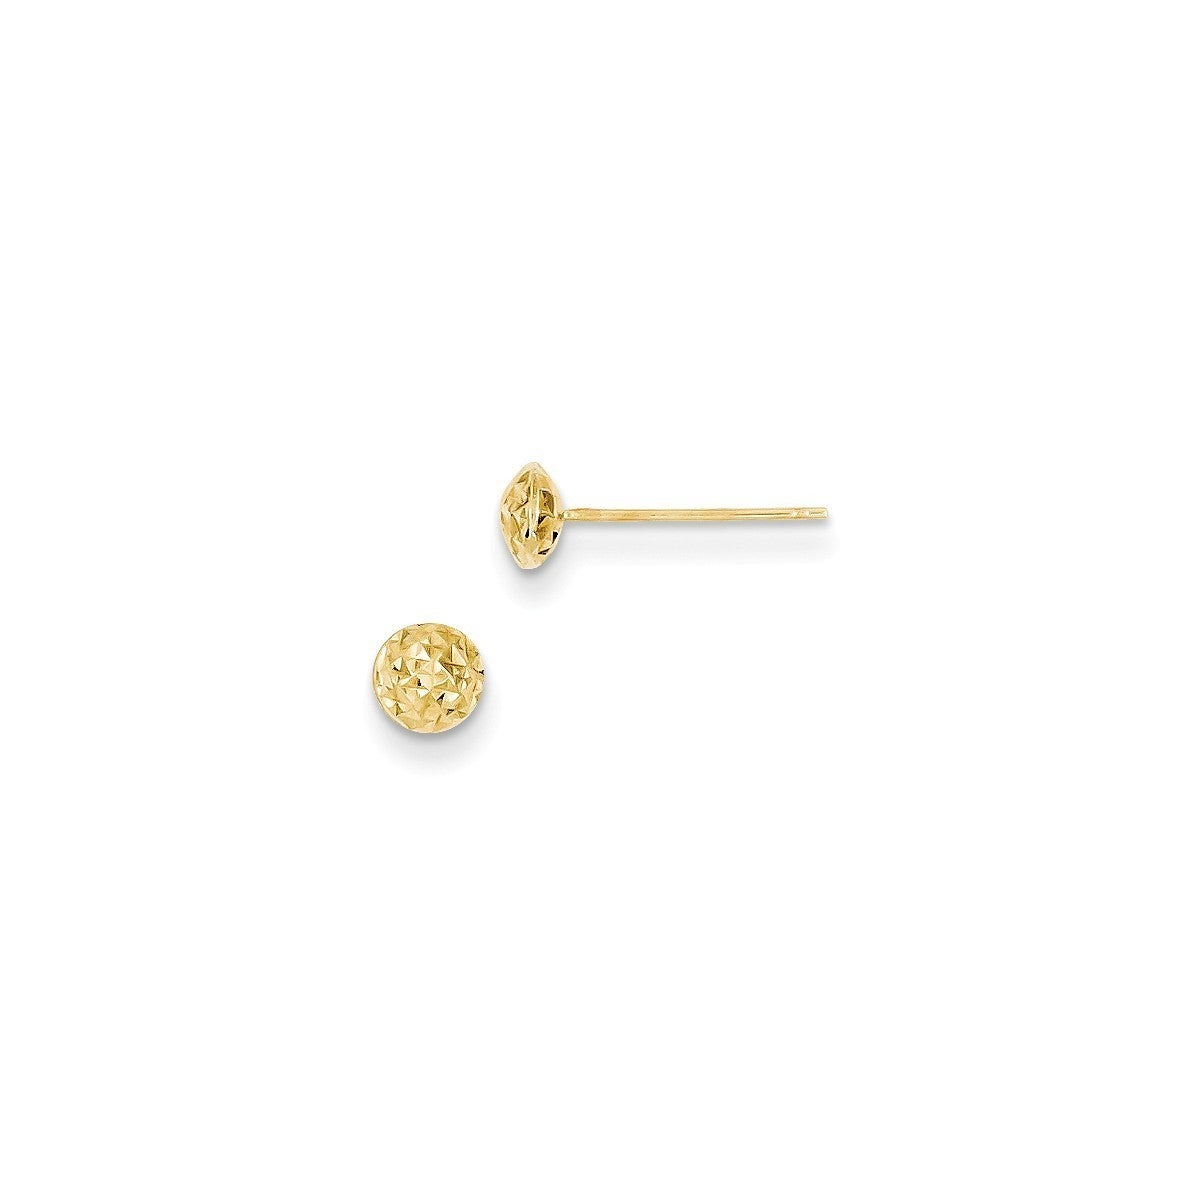 14K White Gold 6mm Circle Puff Post Earrings